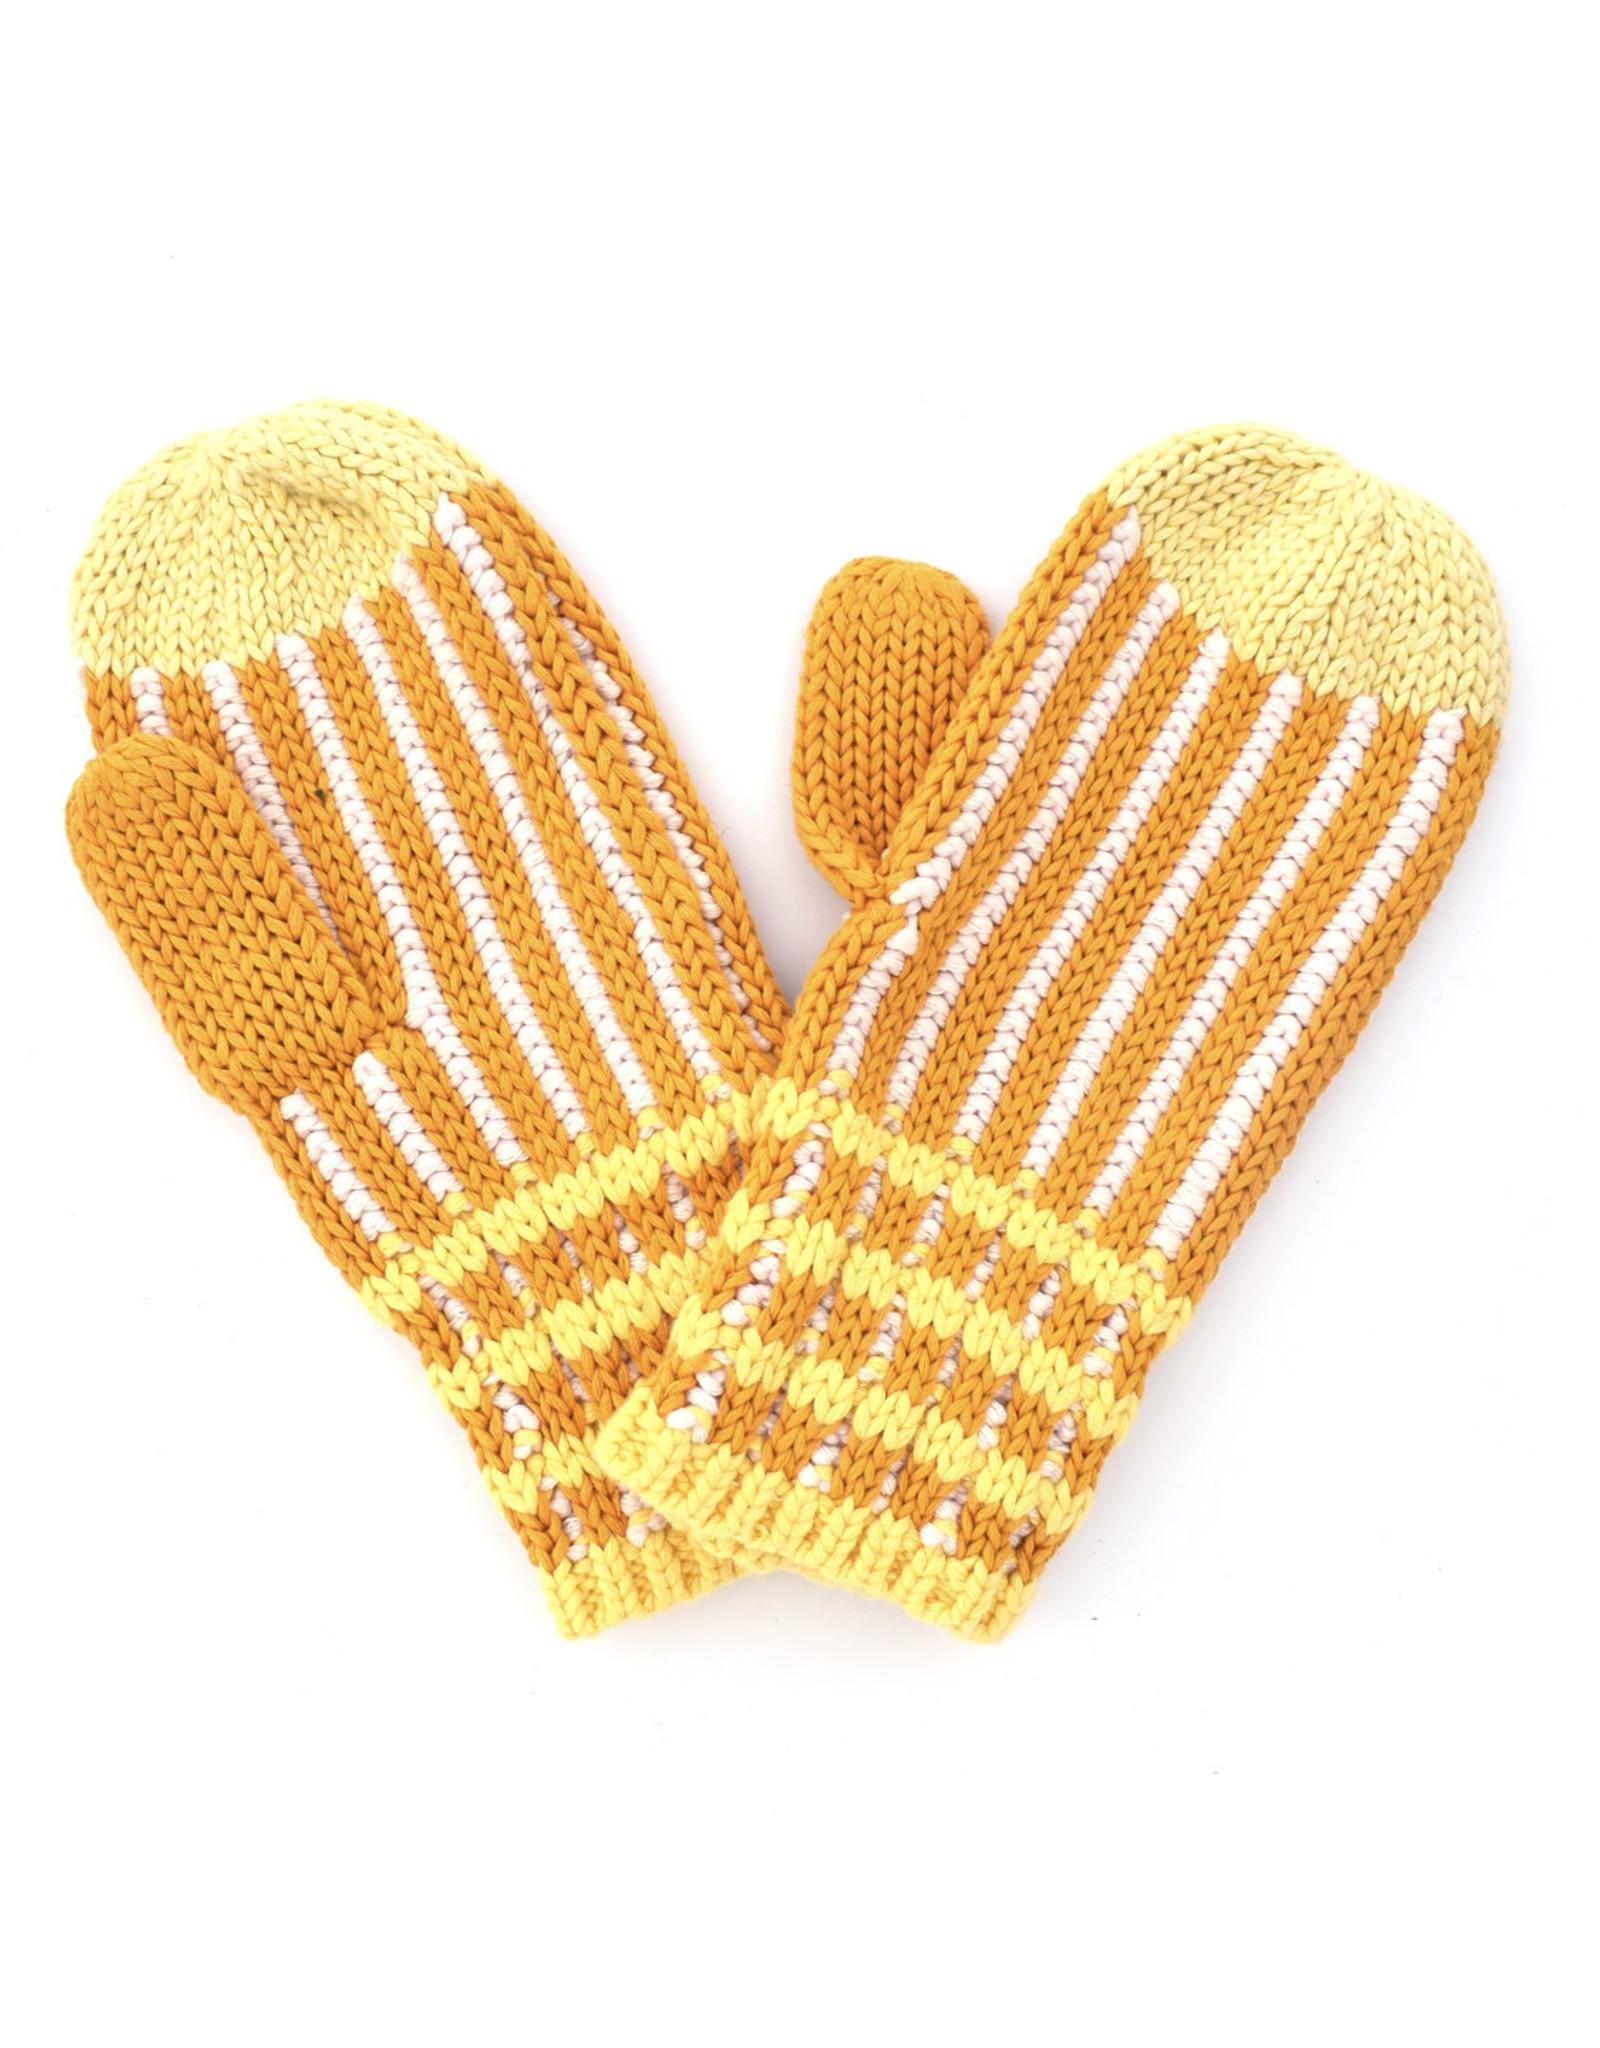 Ribbed Stripe Mitten Yellow